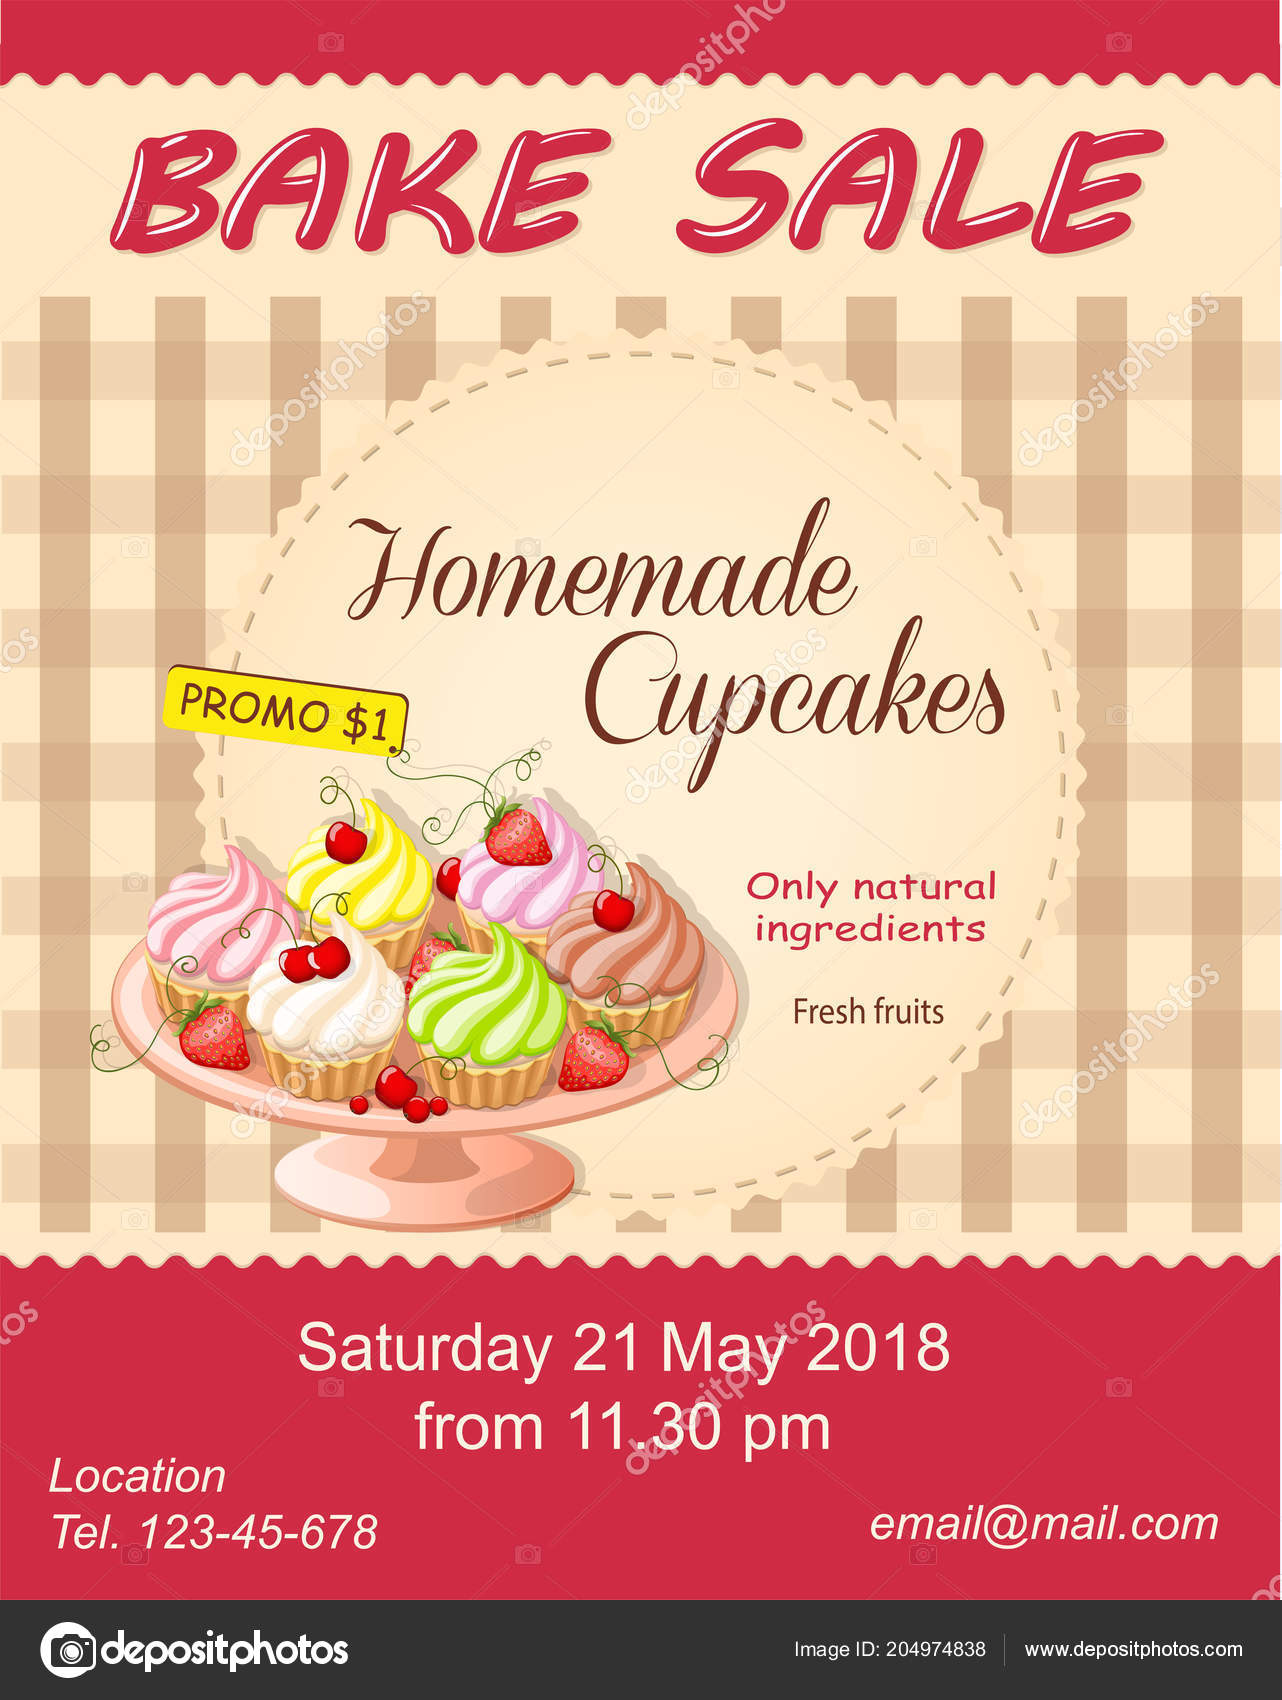 colorful flyer template bake sale promotion banner shop store